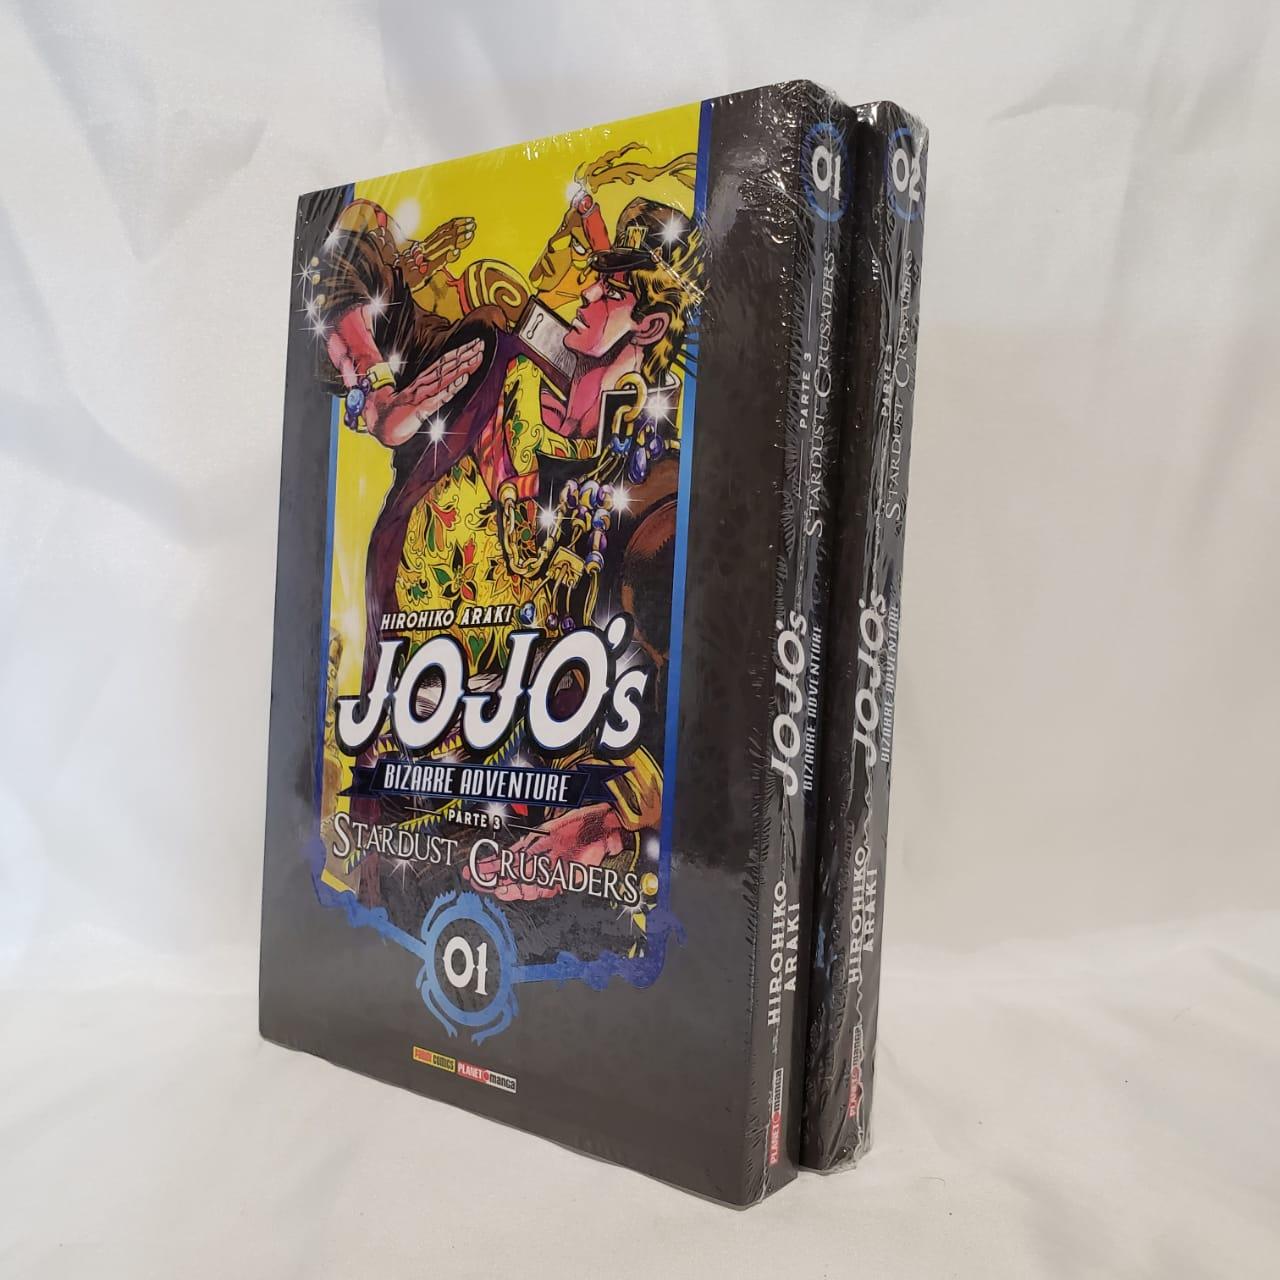 Jojo's Bizarre Adventure Stardust Crusaders - 1 e 2 - Pack